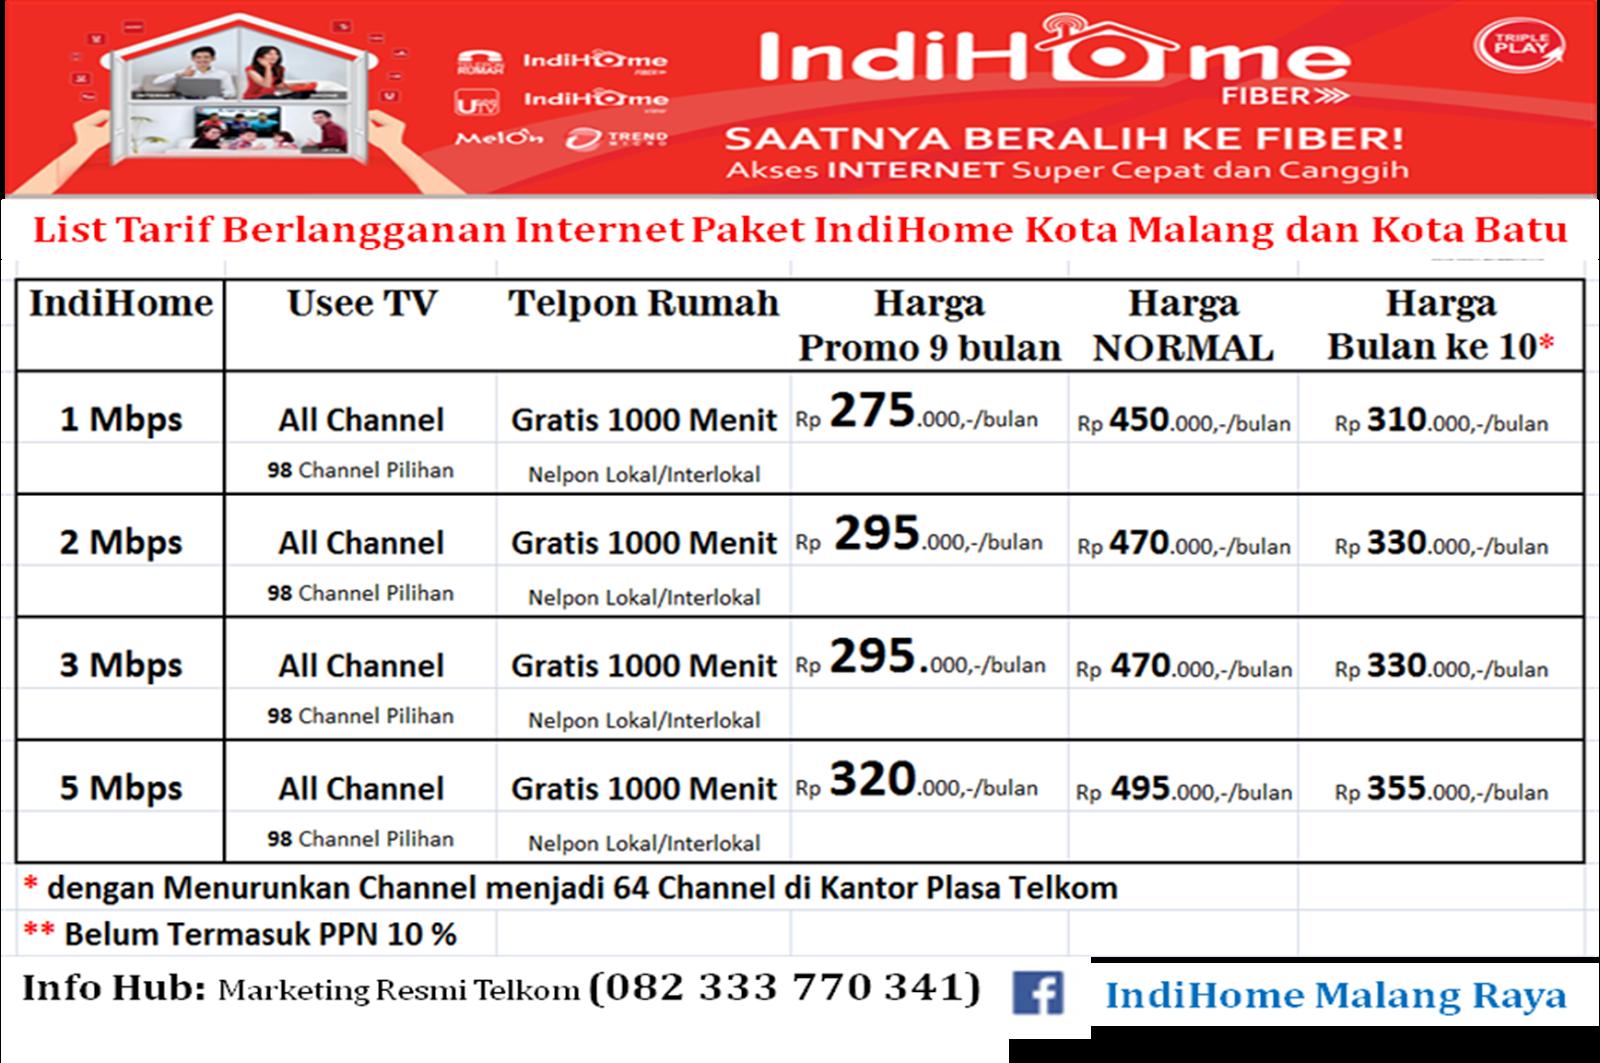 Harga Langganan IndiHome Tahun 2015 Kota Malang, Kab. Malang dan ...